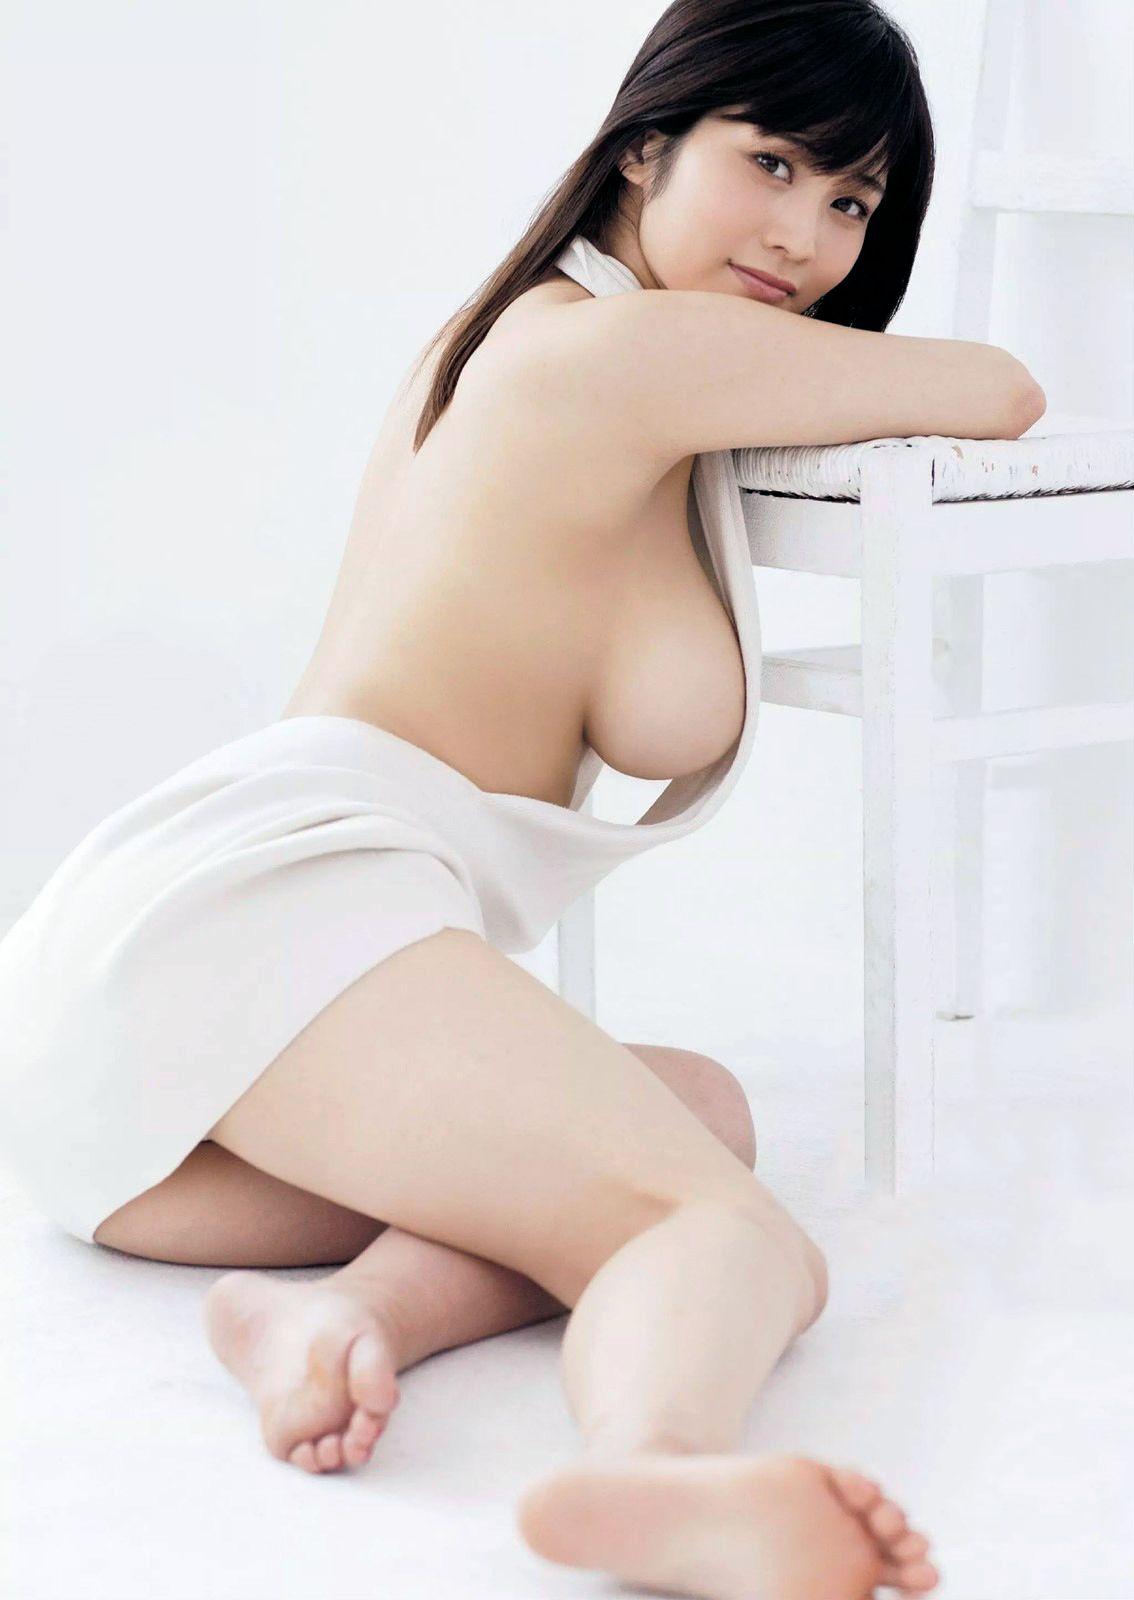 Curvy nudist women models